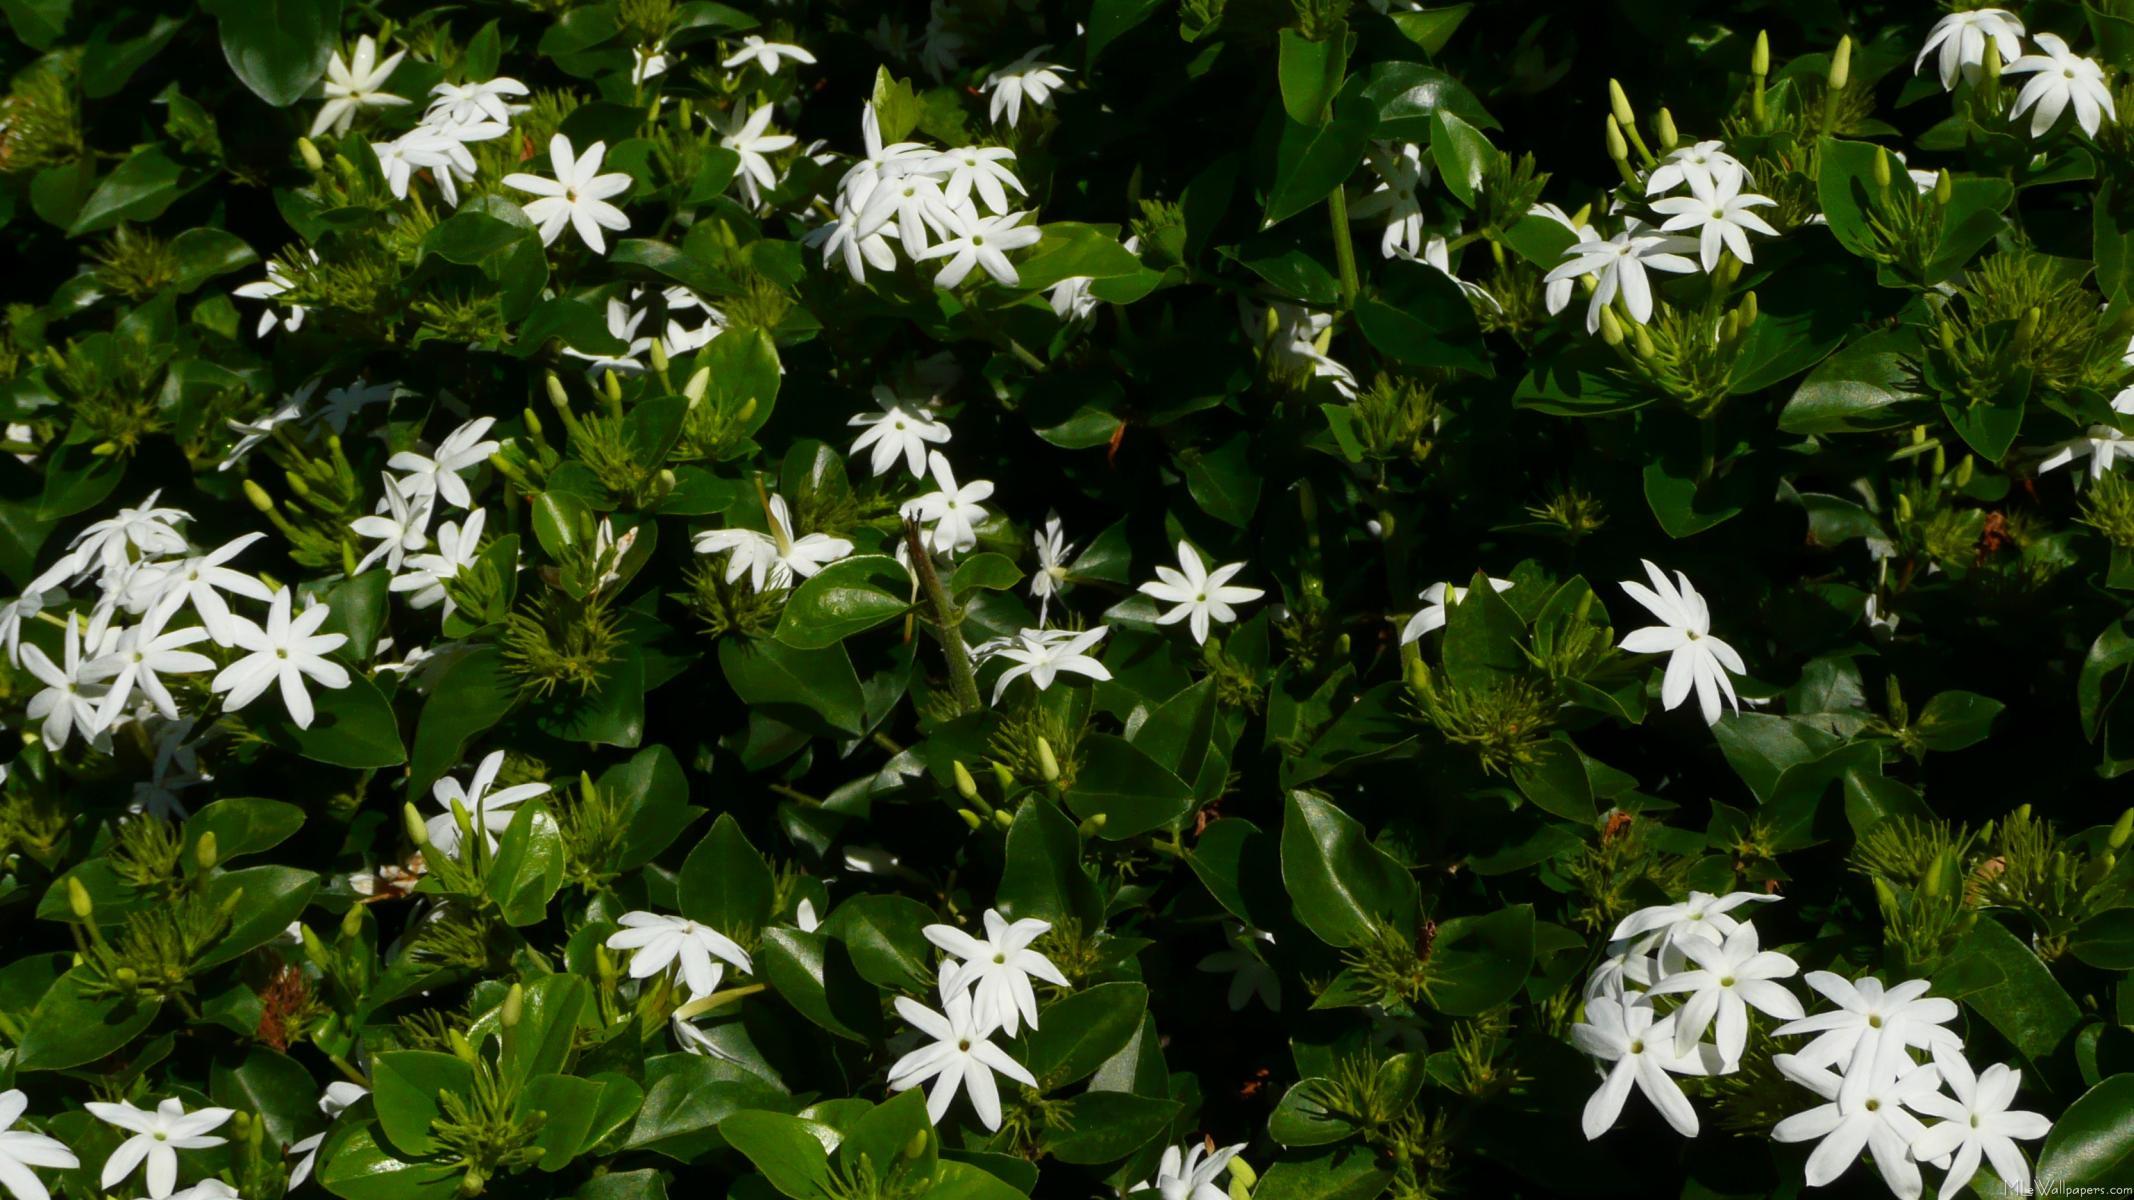 MLeWallpaperscom Jasmine Flowers